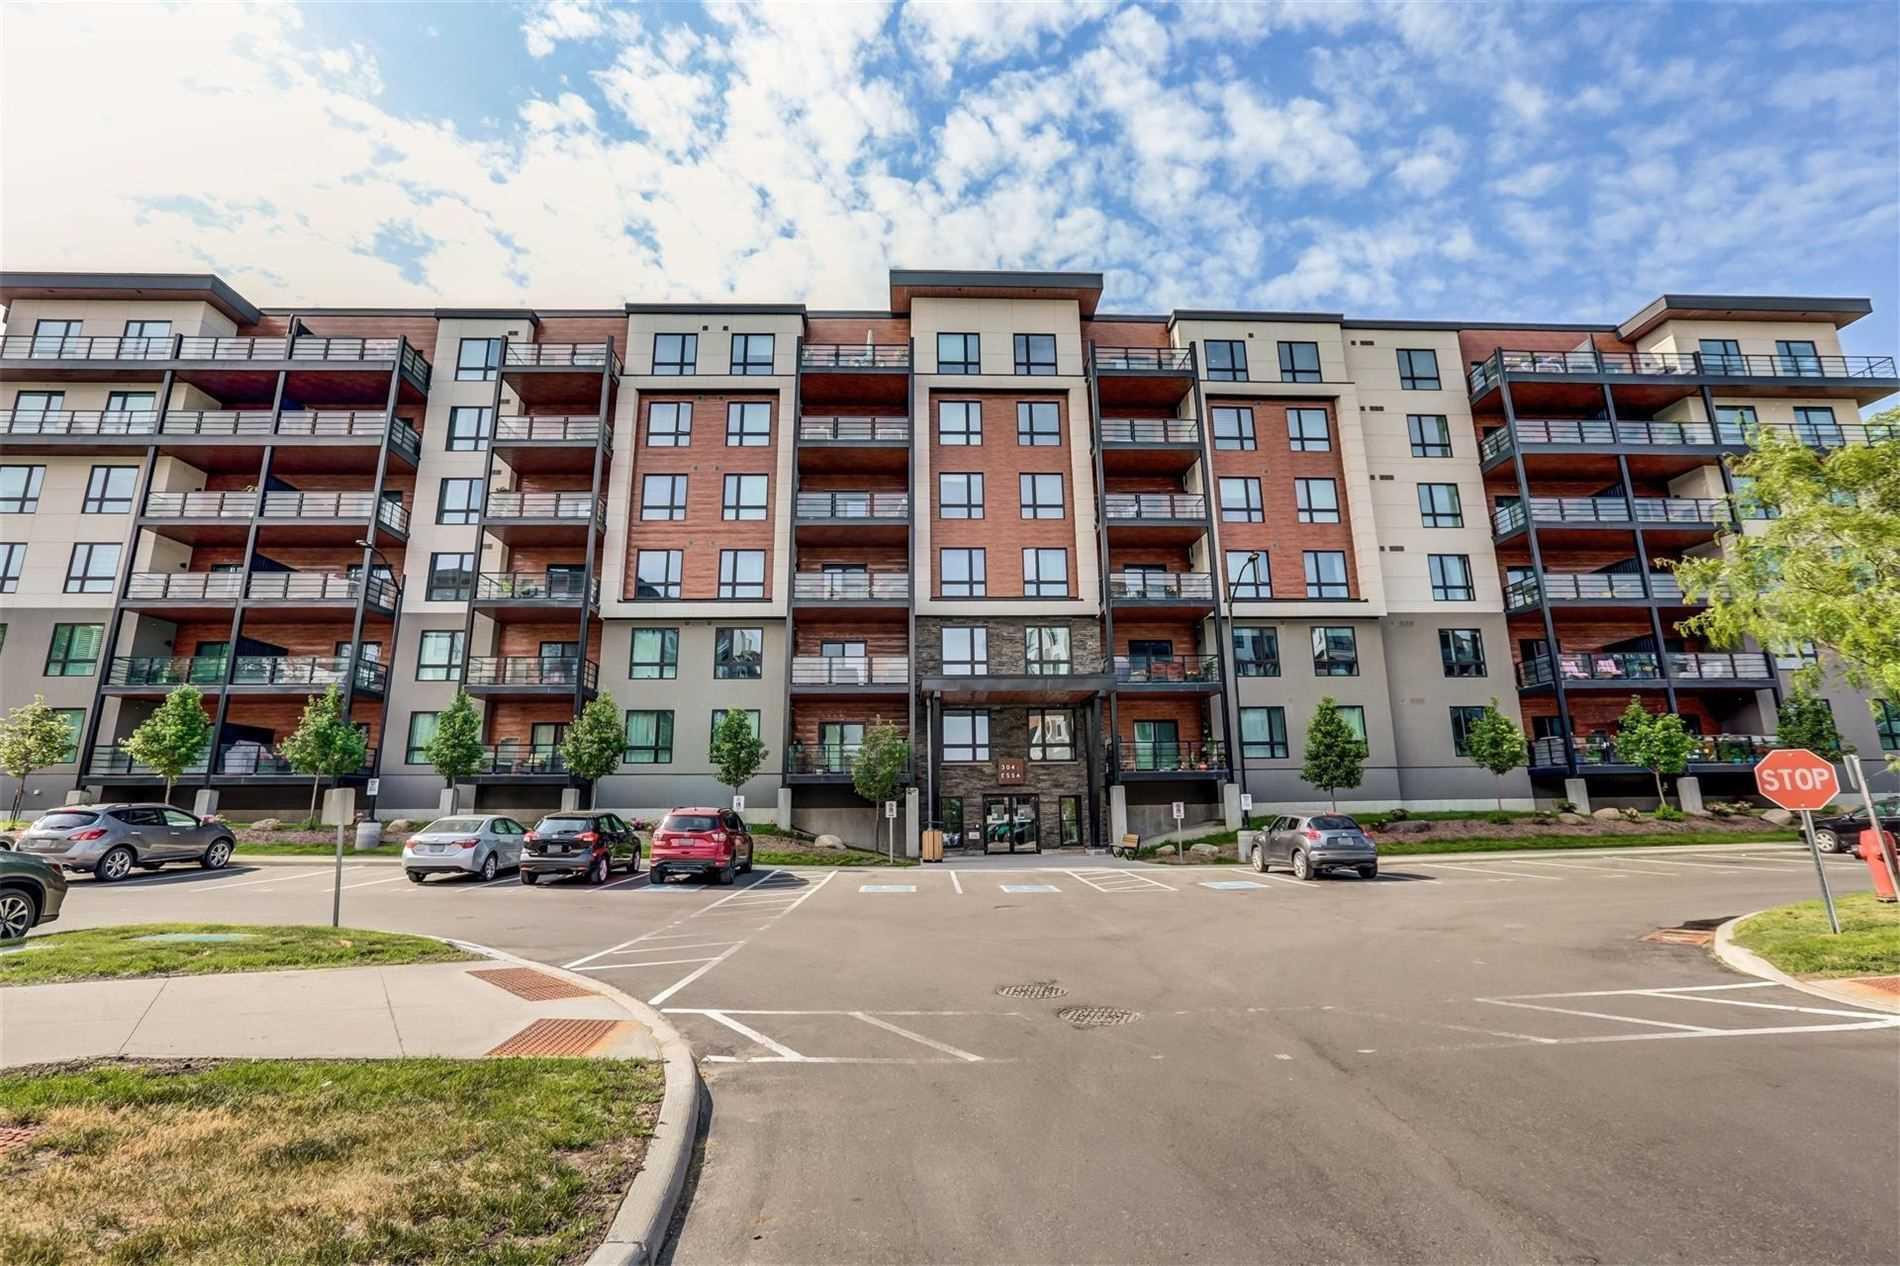 304 Essa Rd, Barrie, Ontario L9J 0H4, 2 Bedrooms Bedrooms, ,2 BathroomsBathrooms,Condo Apt,For Sale,Essa,S5273059